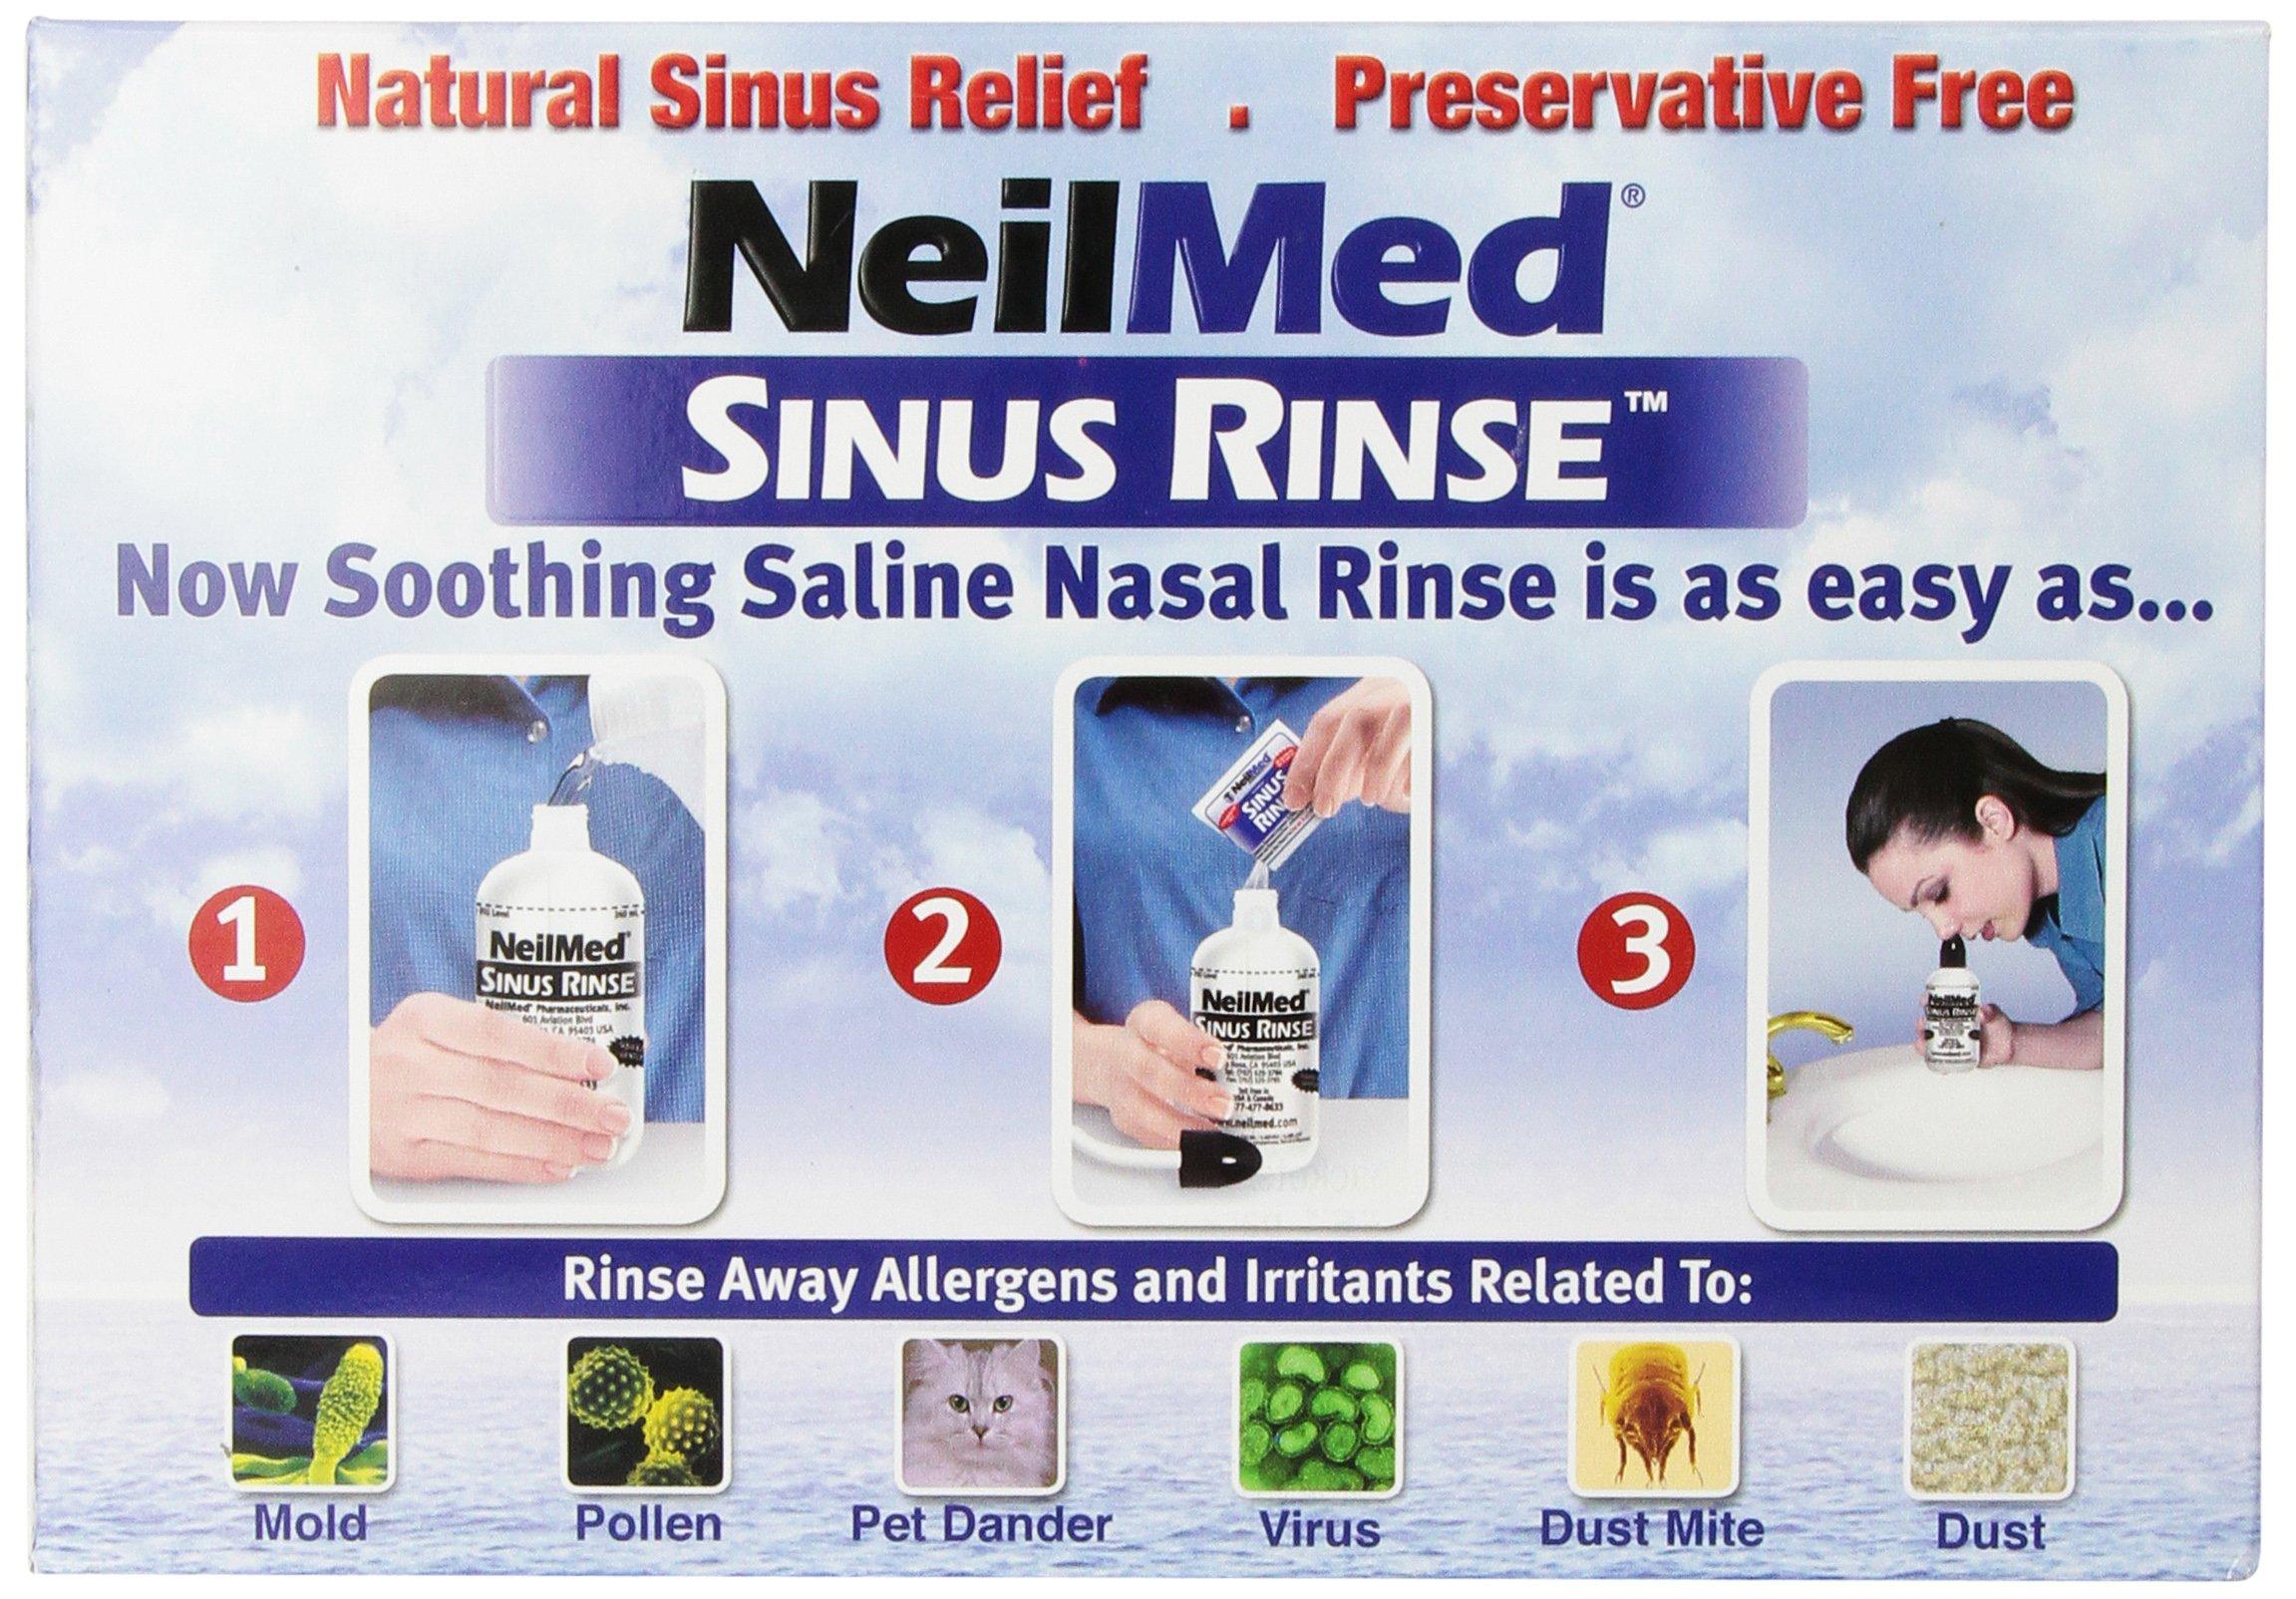 NeilMed Sinus Rinse - 2 squeeze Bottles 240mL (8fl oz) & Nasamist Saline Spray 75mL - 250 Premixed Packets - BONUS Nasa Mist Saline Spray - Value Pack